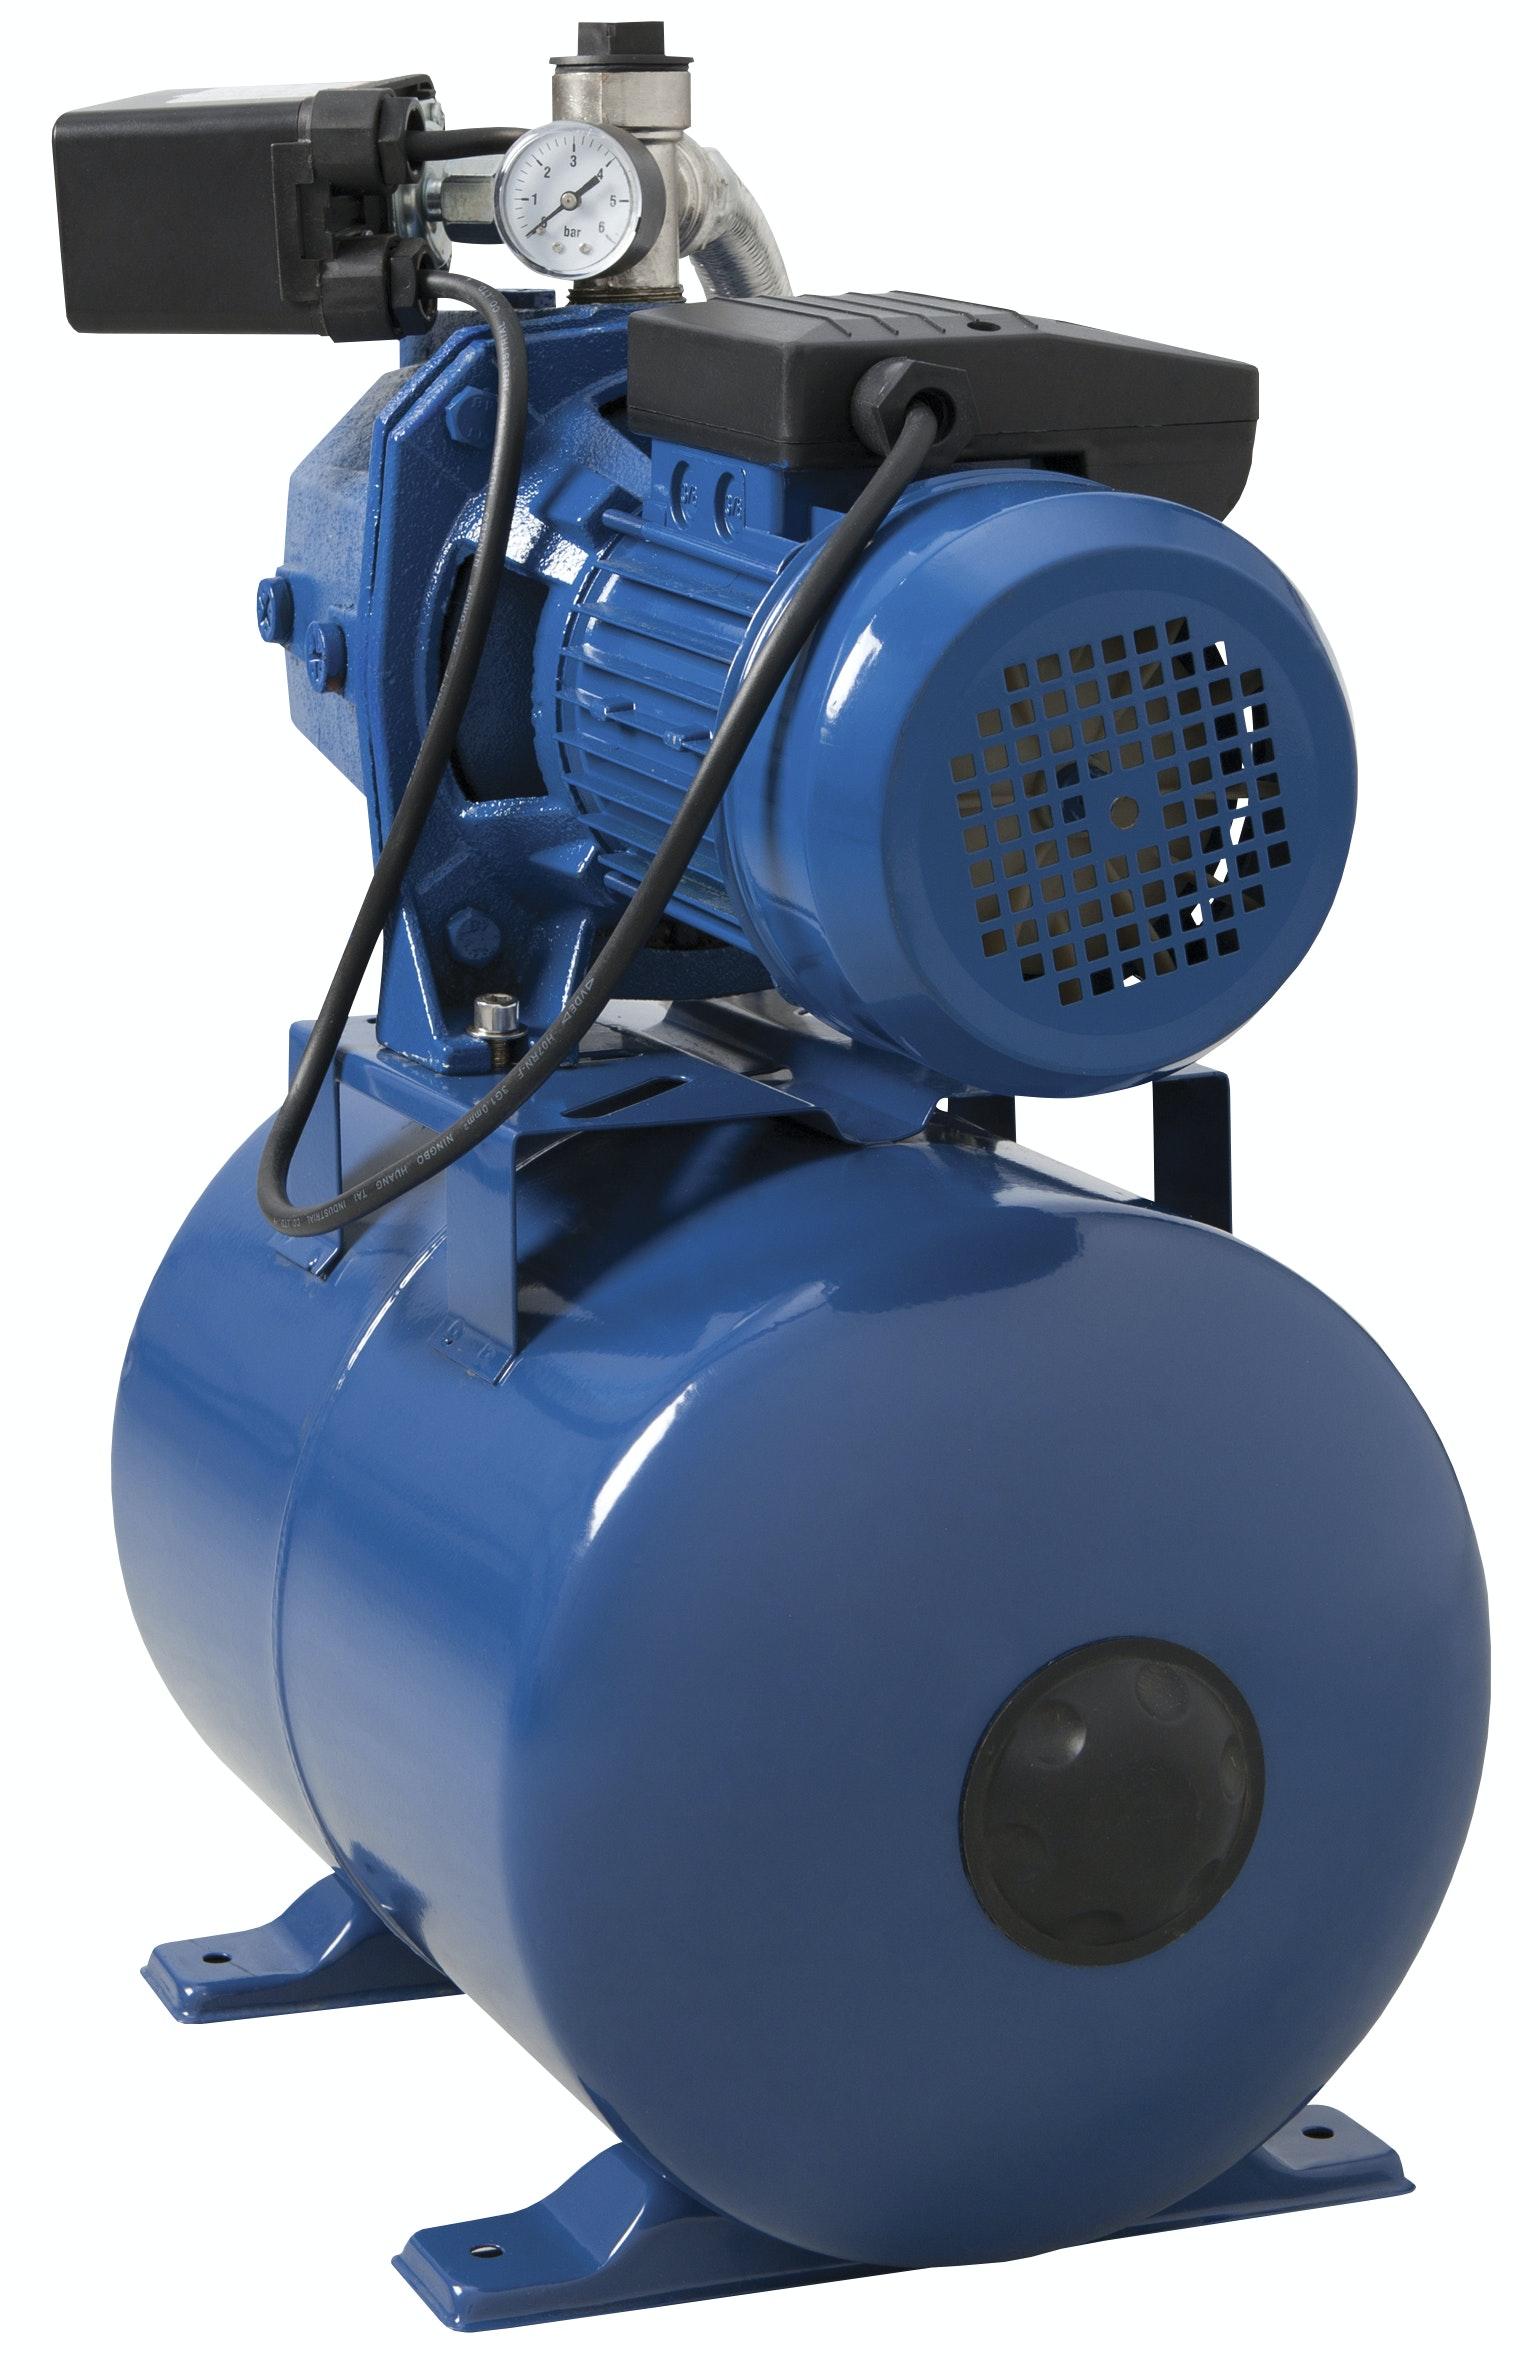 Pumpautomat Robota Execellent Jet GJ100C/24 Med Hydropress